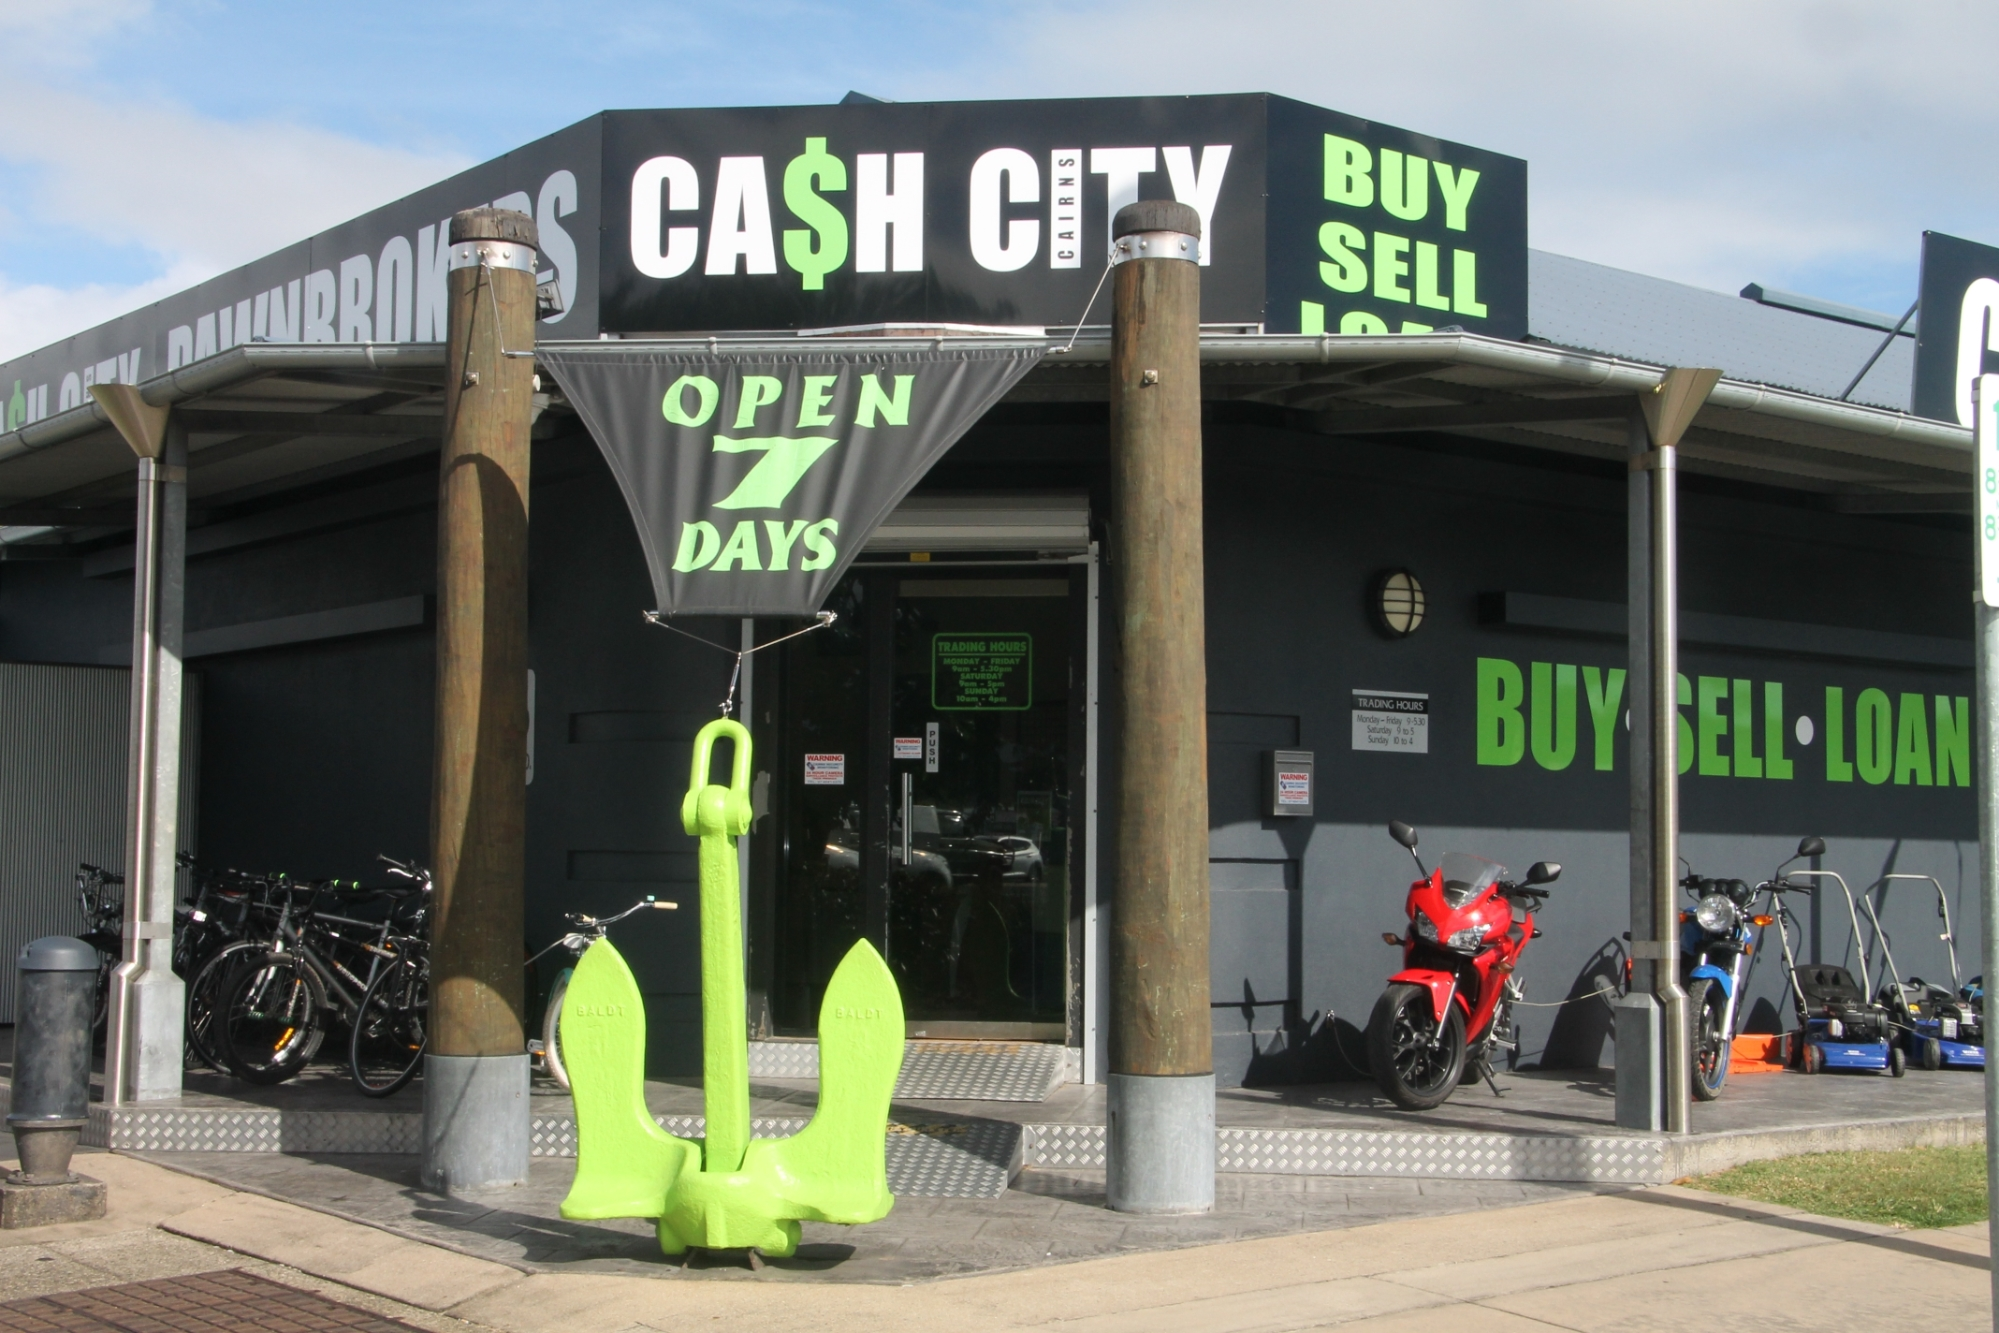 Low money loans photo 7